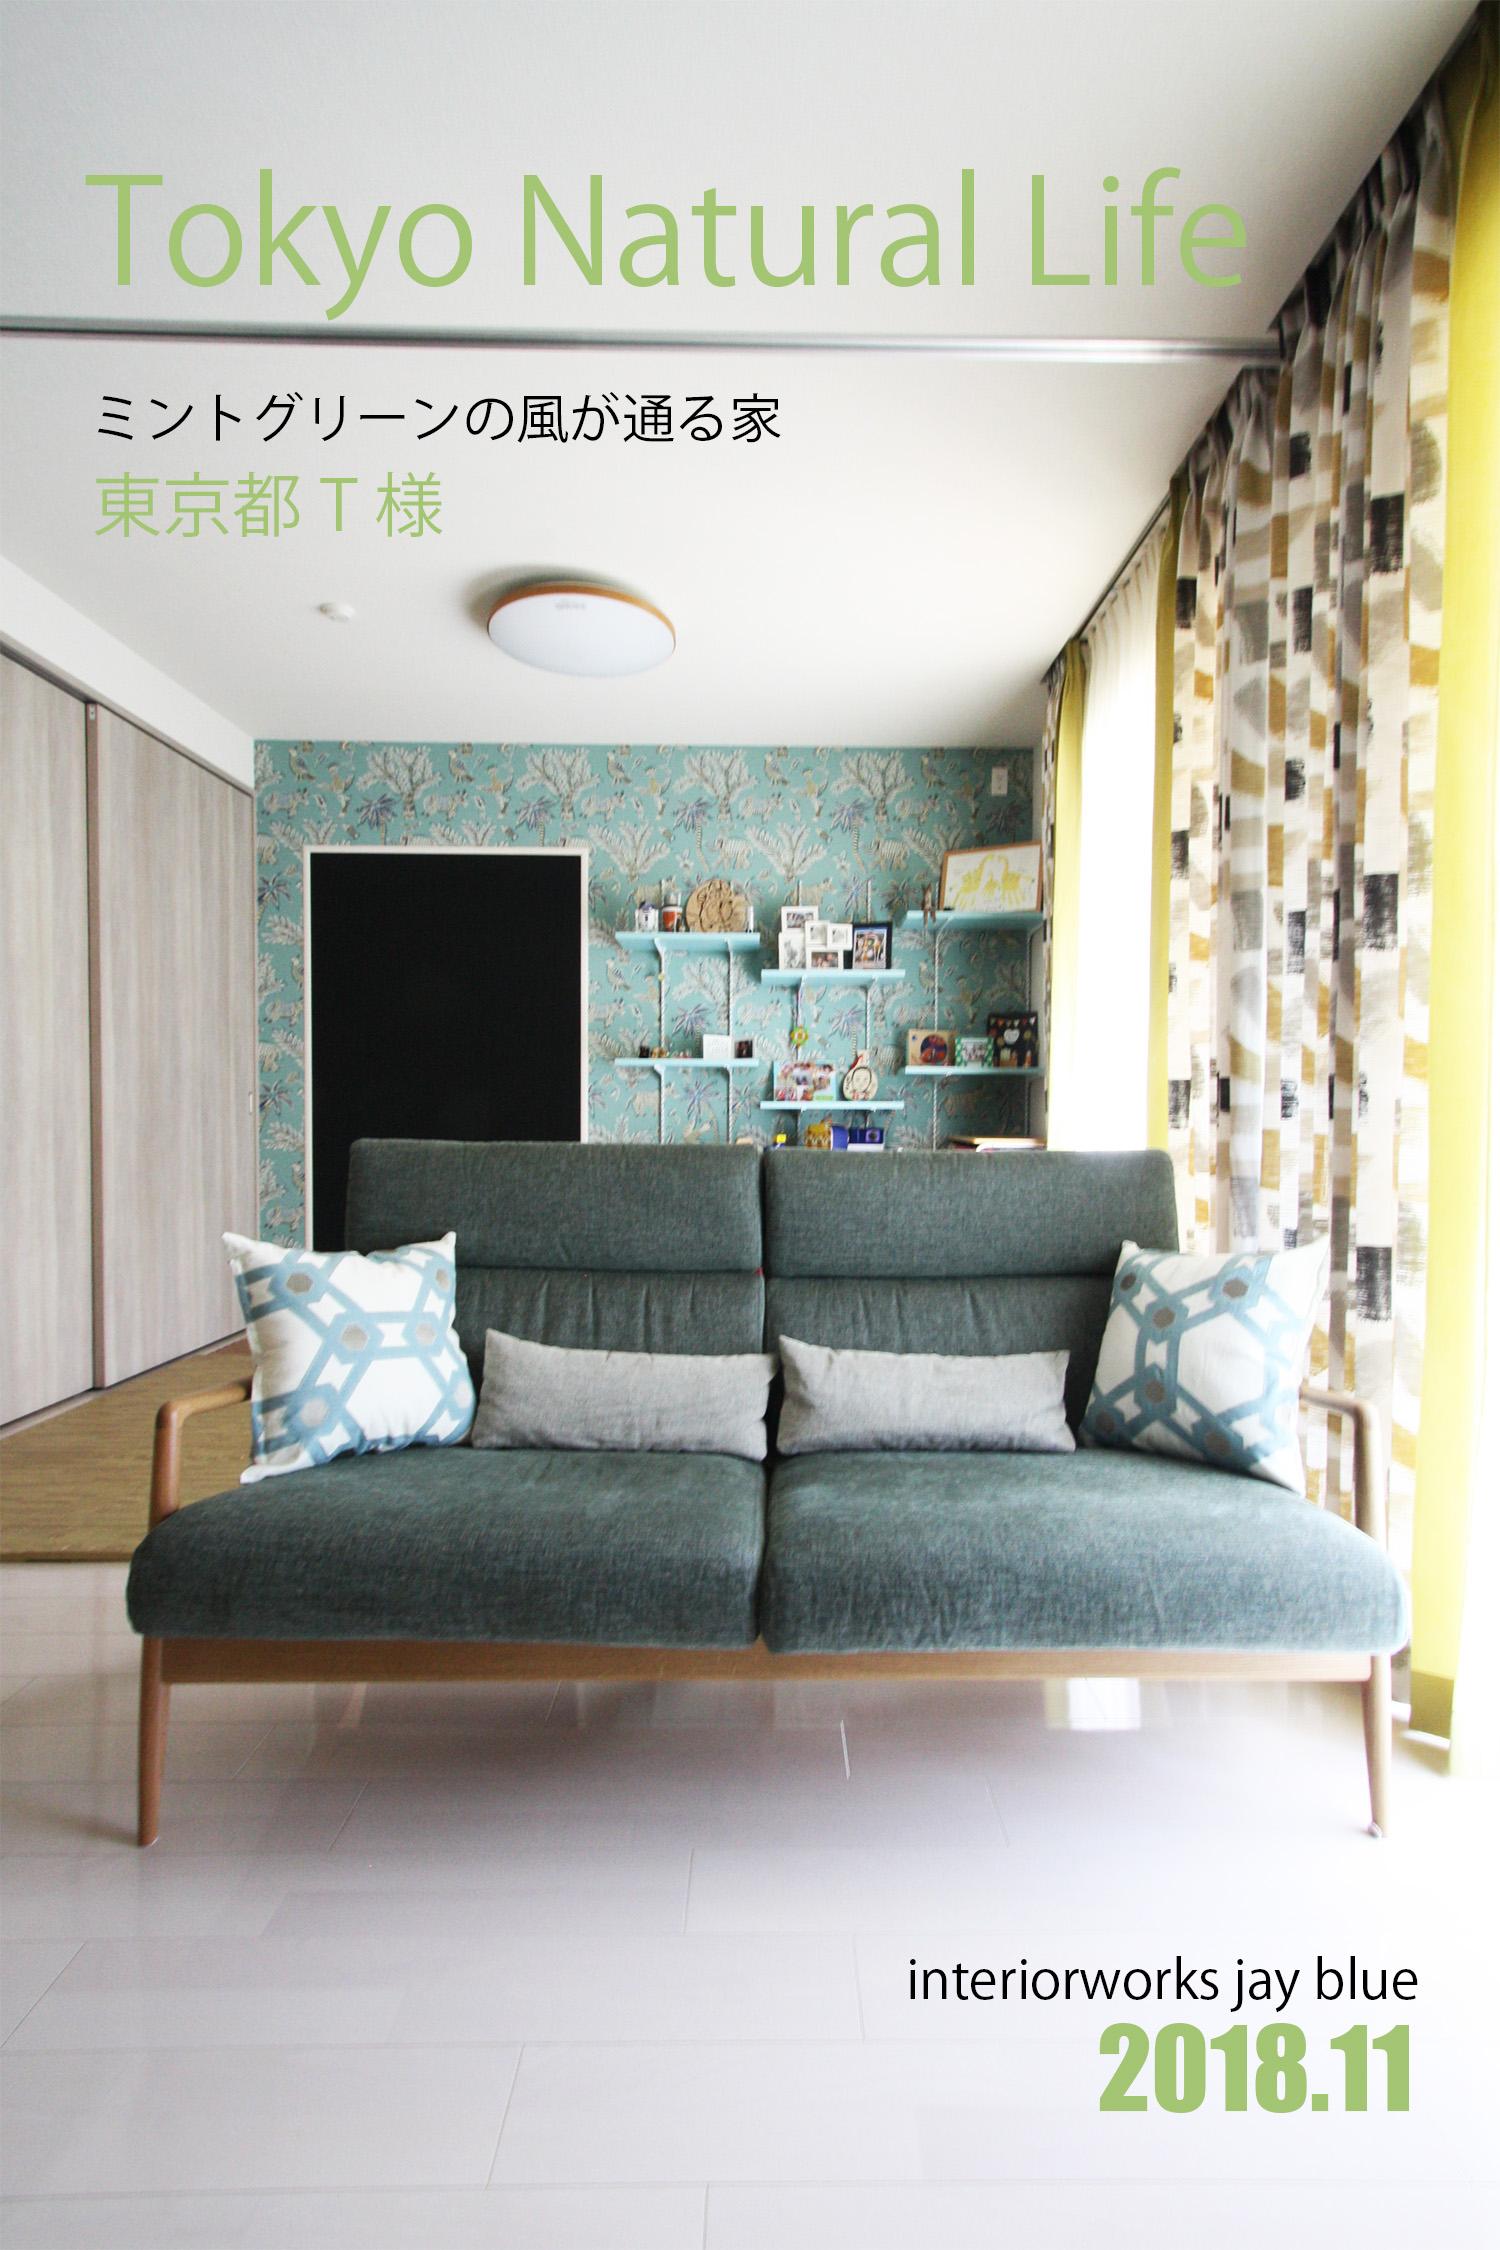 Tokyo Natural Life ミントグリーンの風が通る家 東京都北区t様